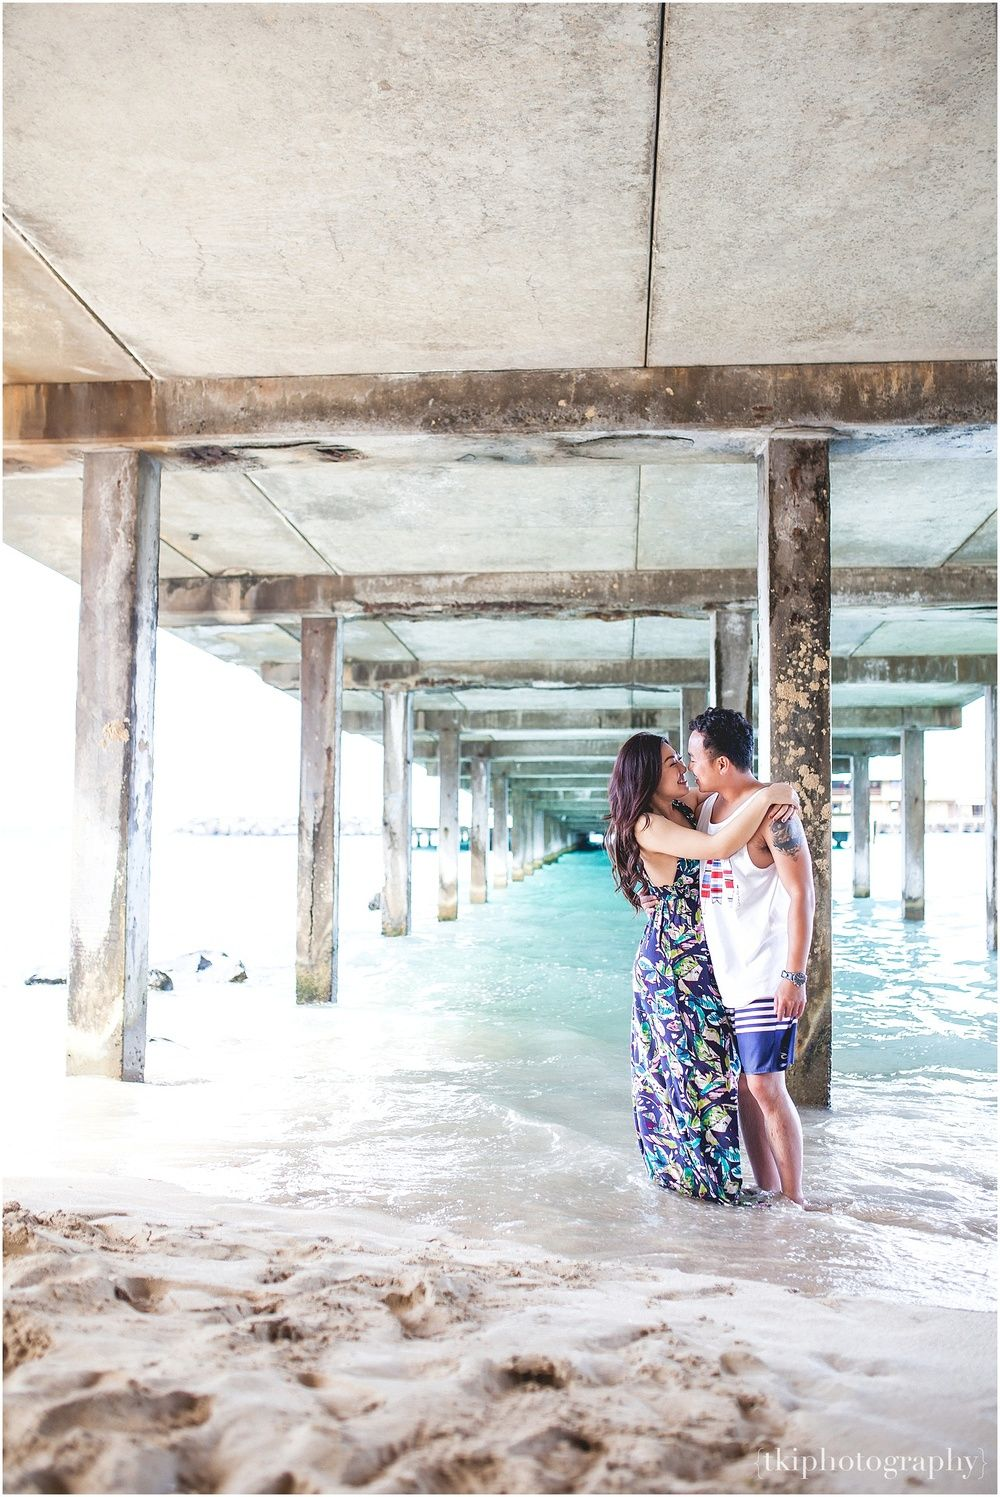 Under the Pier at Makapuu. Engagement in Hawaii. Cruising around the island!